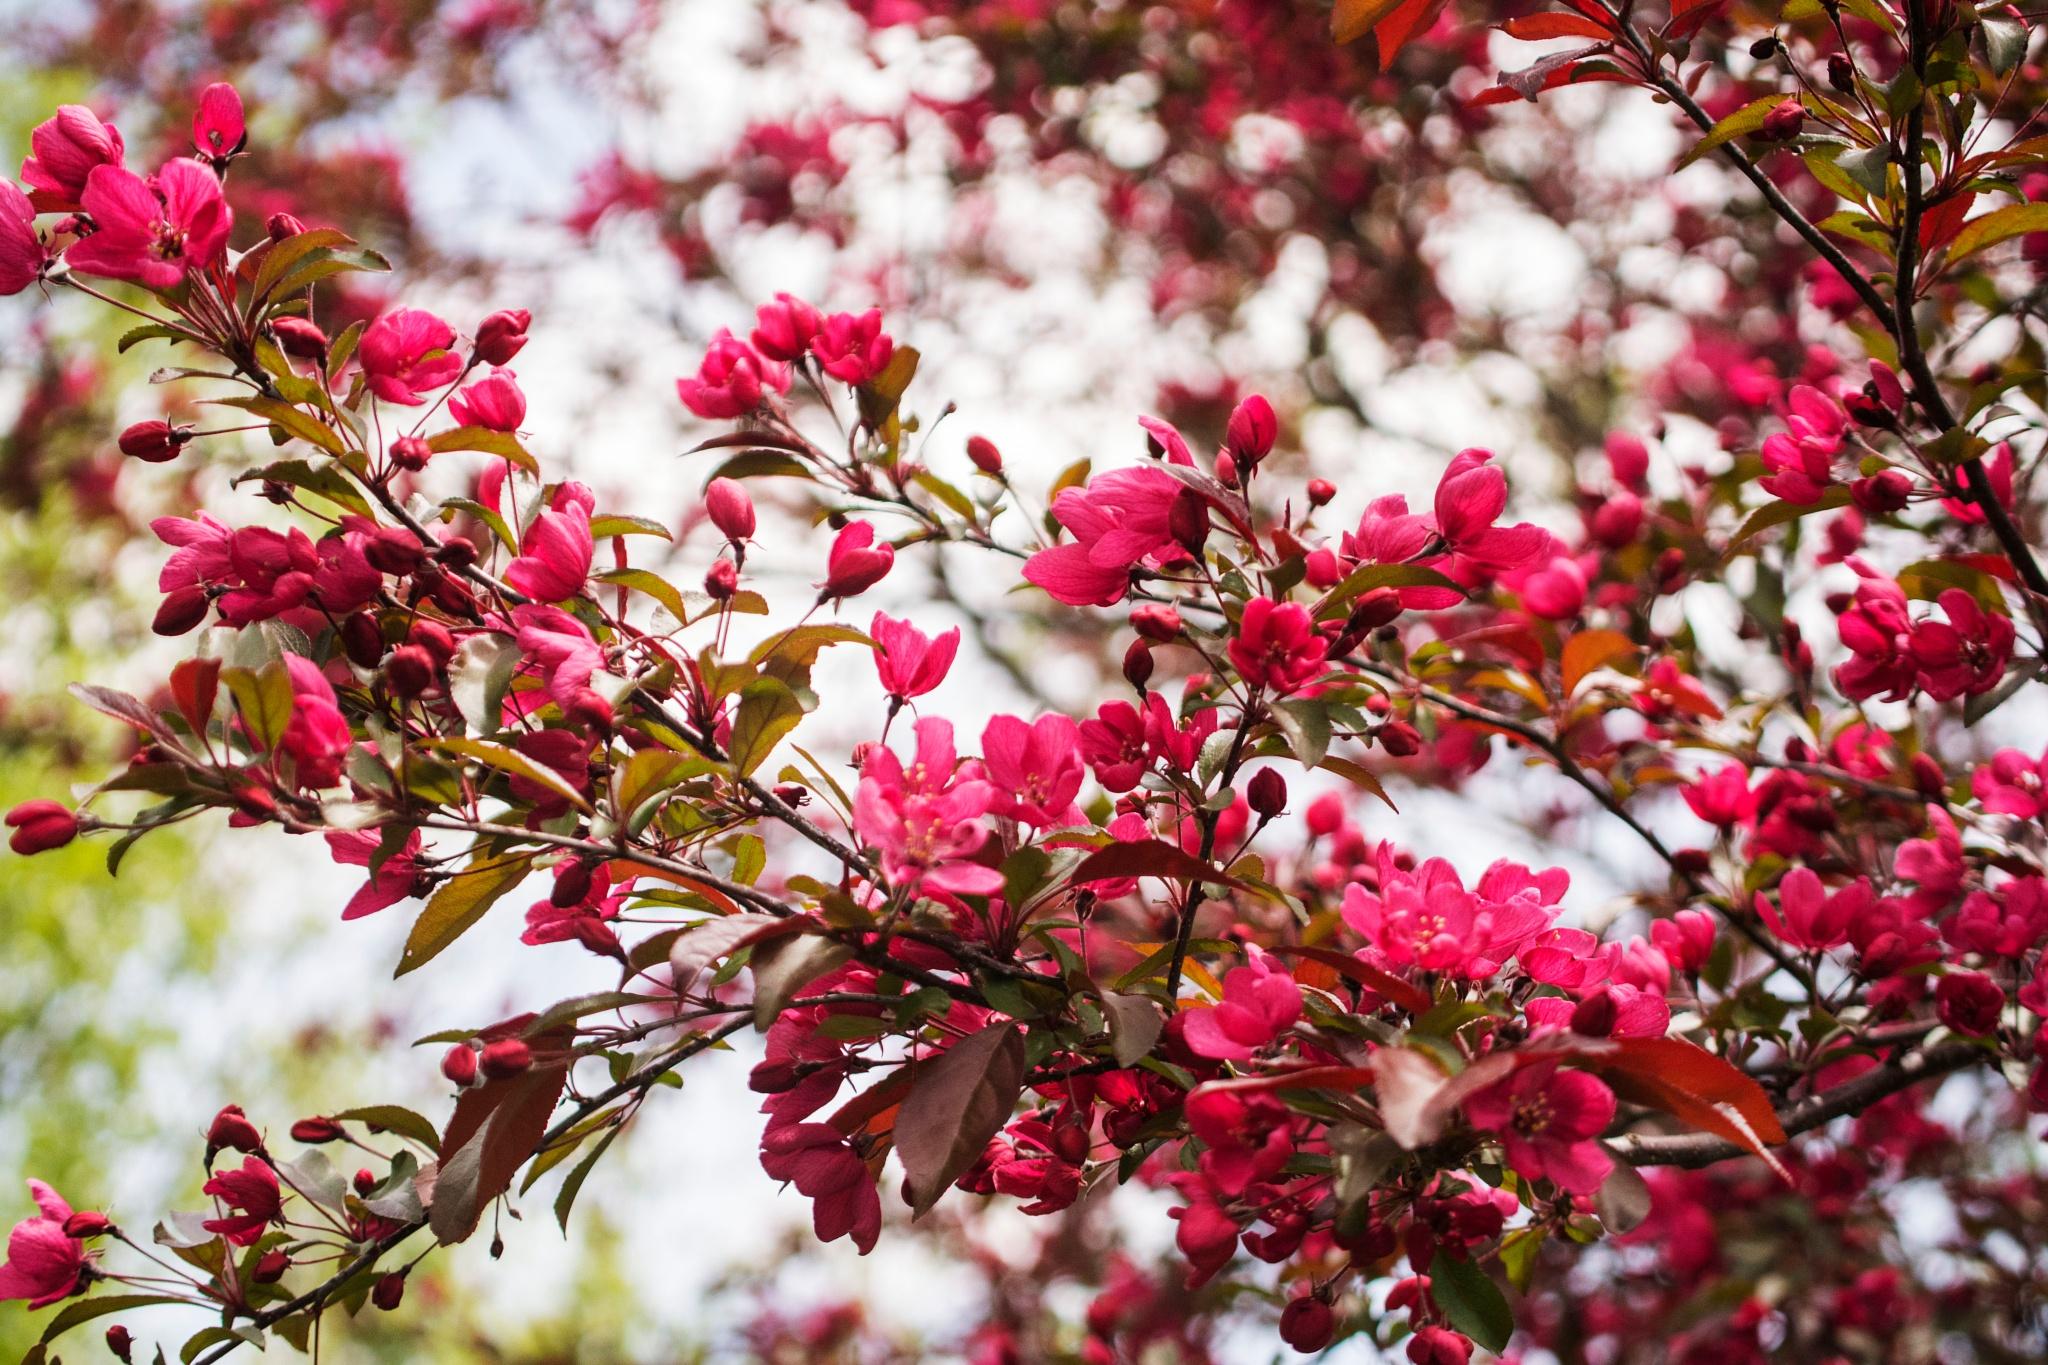 Beauty of Spring II by Wayne L. Talbot